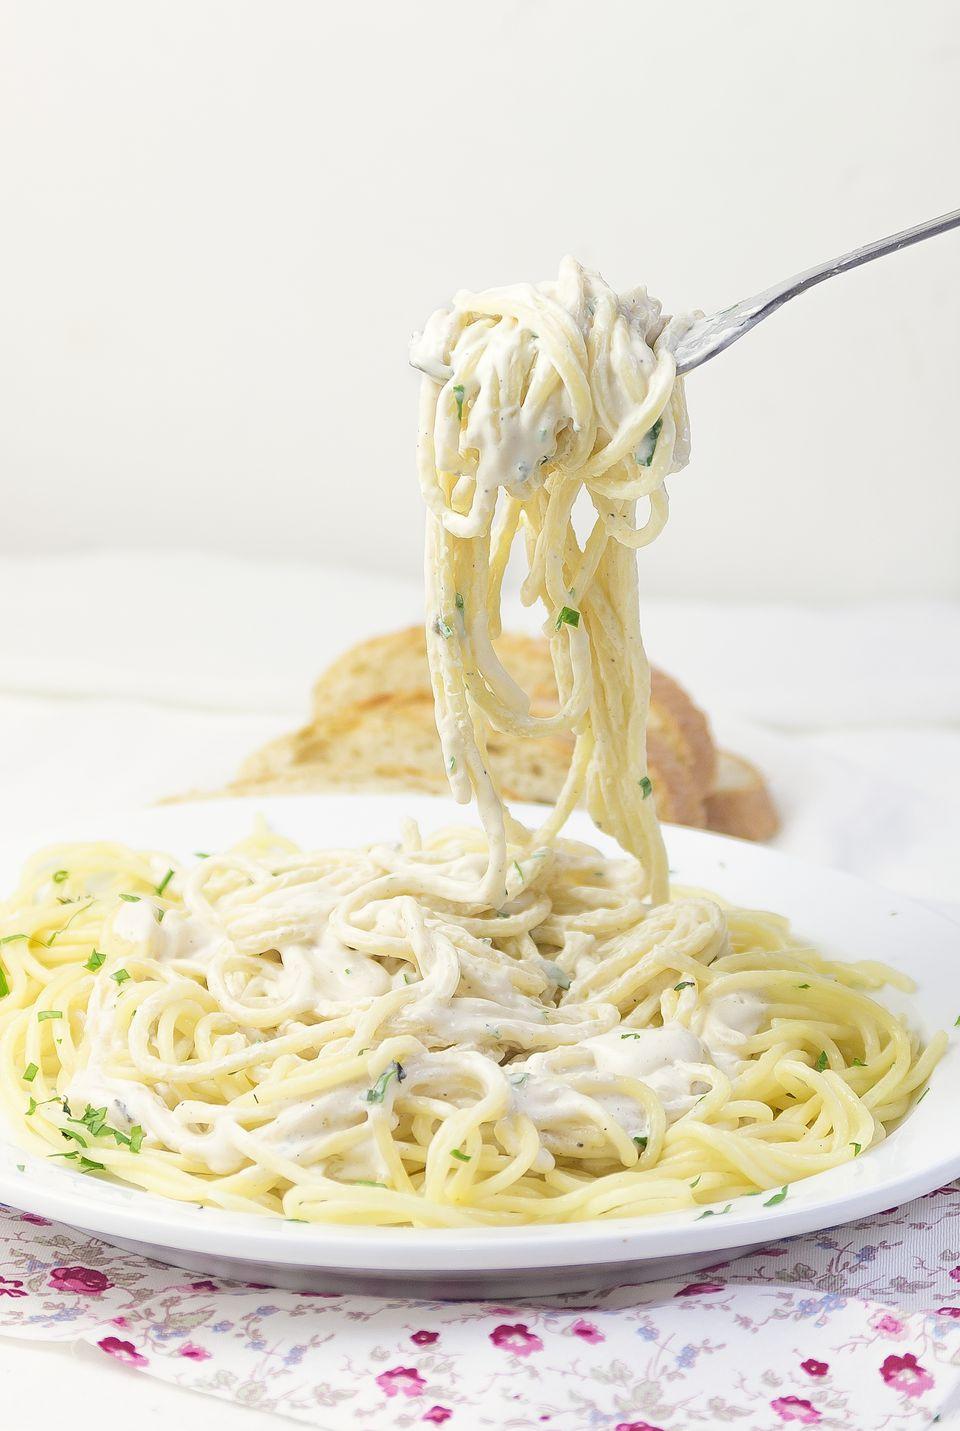 Pasta with vegan white sauce